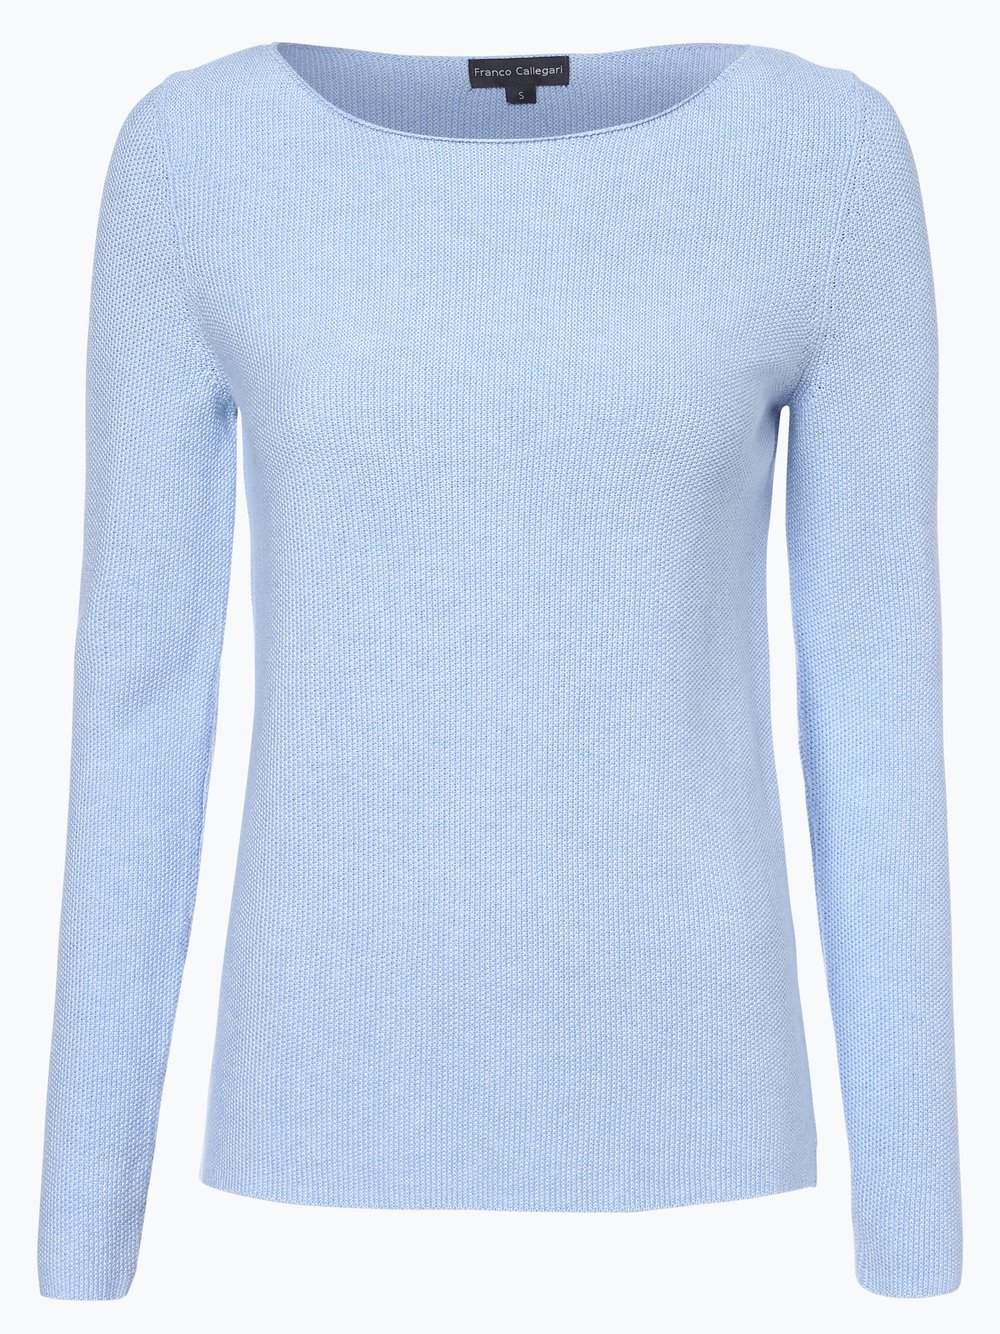 Franco Callegari - Sweter damski, niebieski